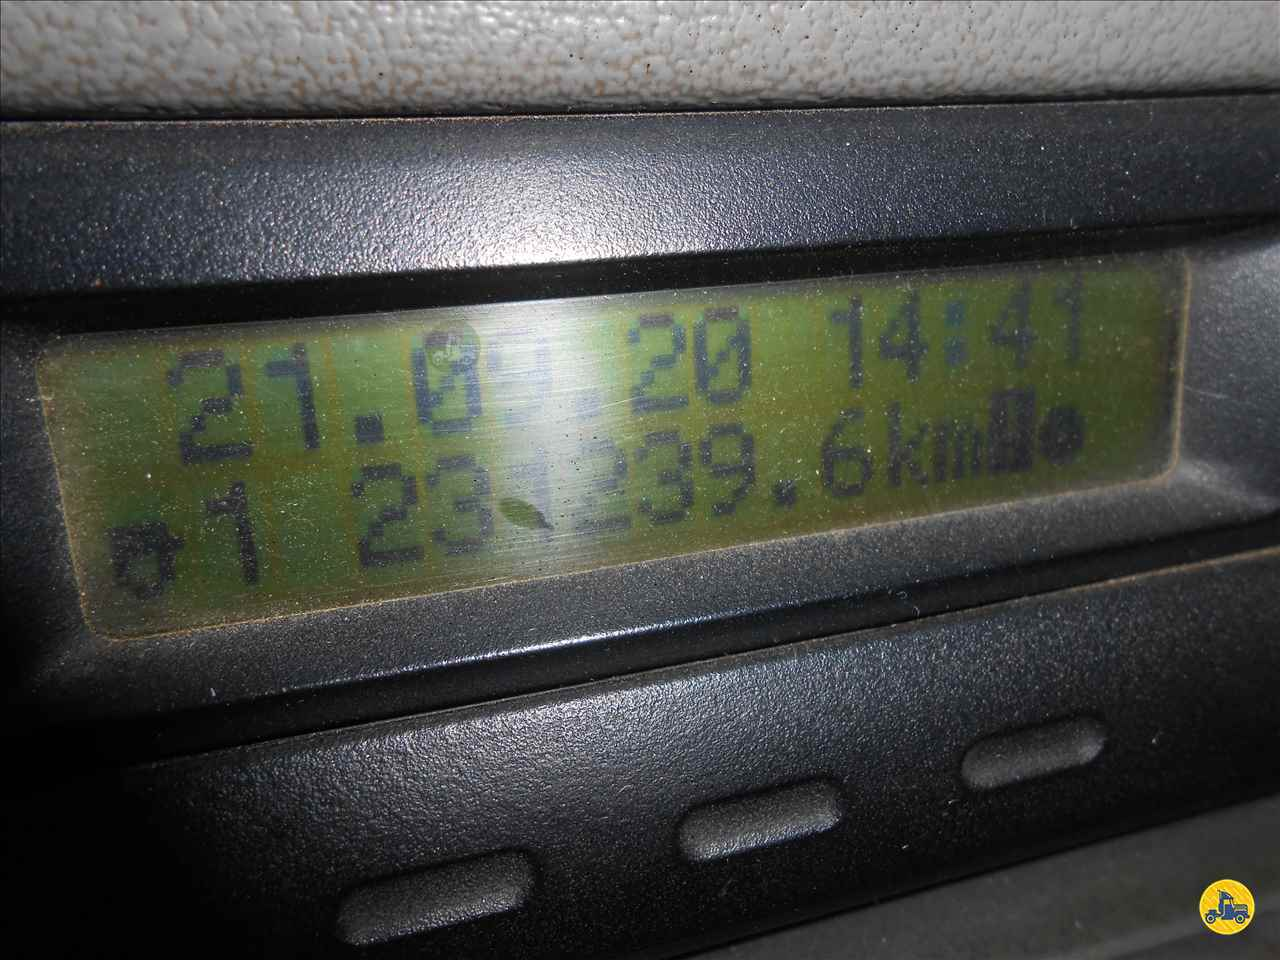 VOLKSWAGEN VW 8150 230000km 2004/2005 Vieira Caminhões